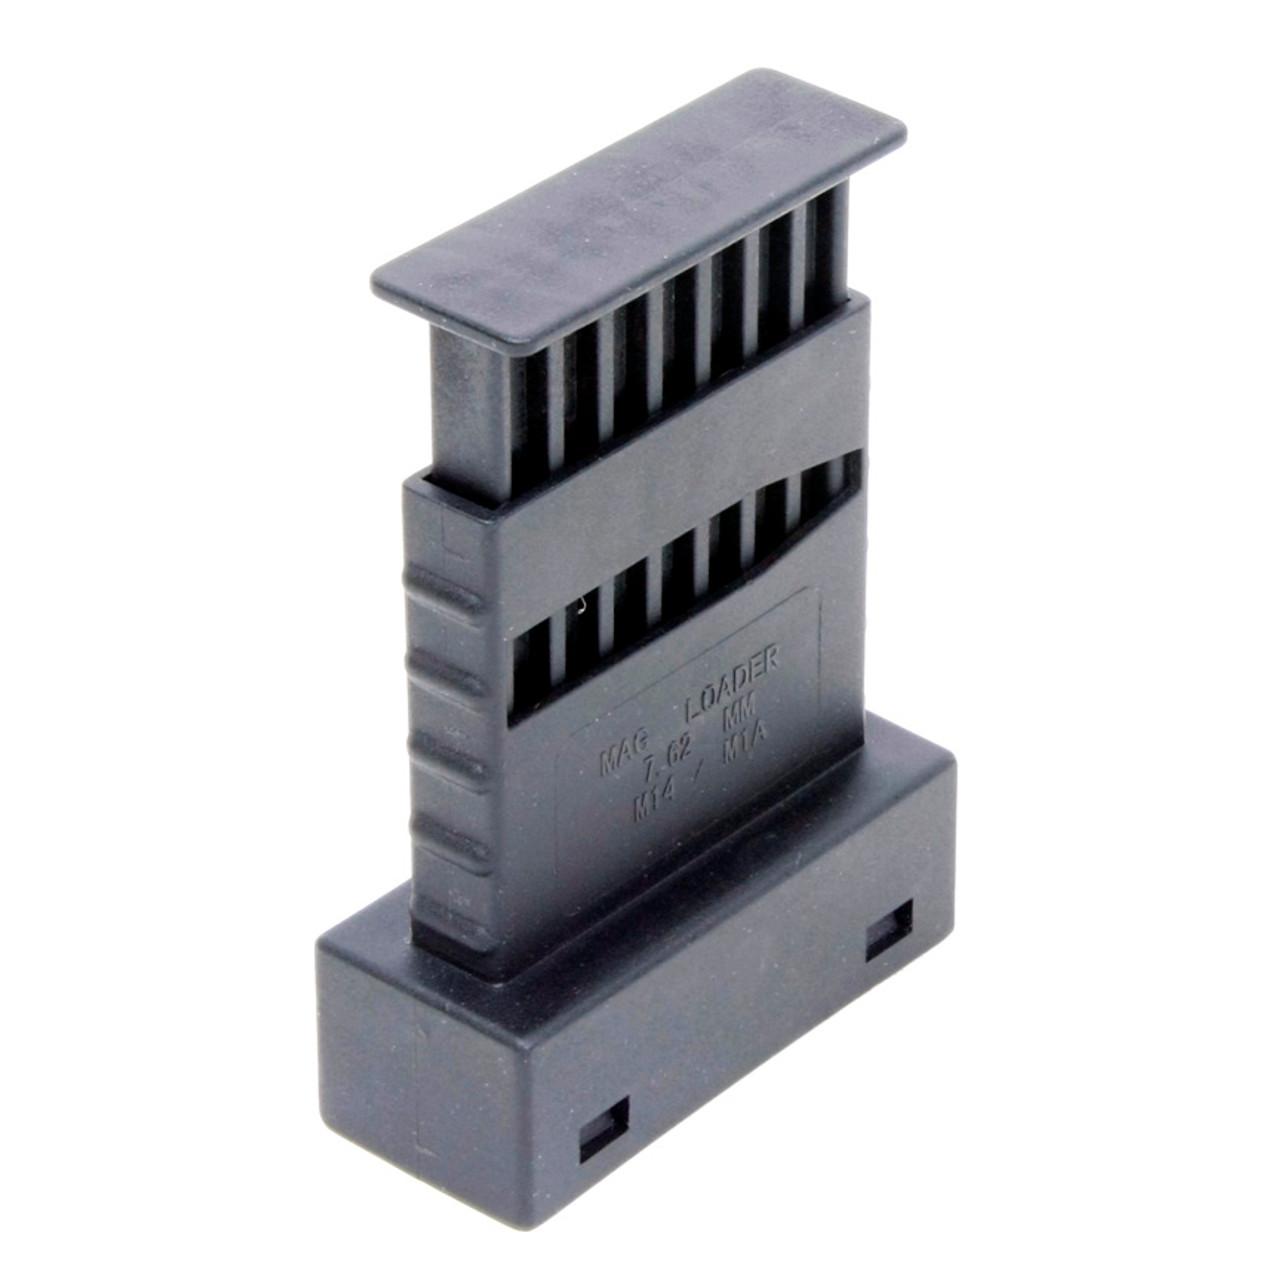 M1A™ / M14 USGI Magazine Loader - Black Polymer